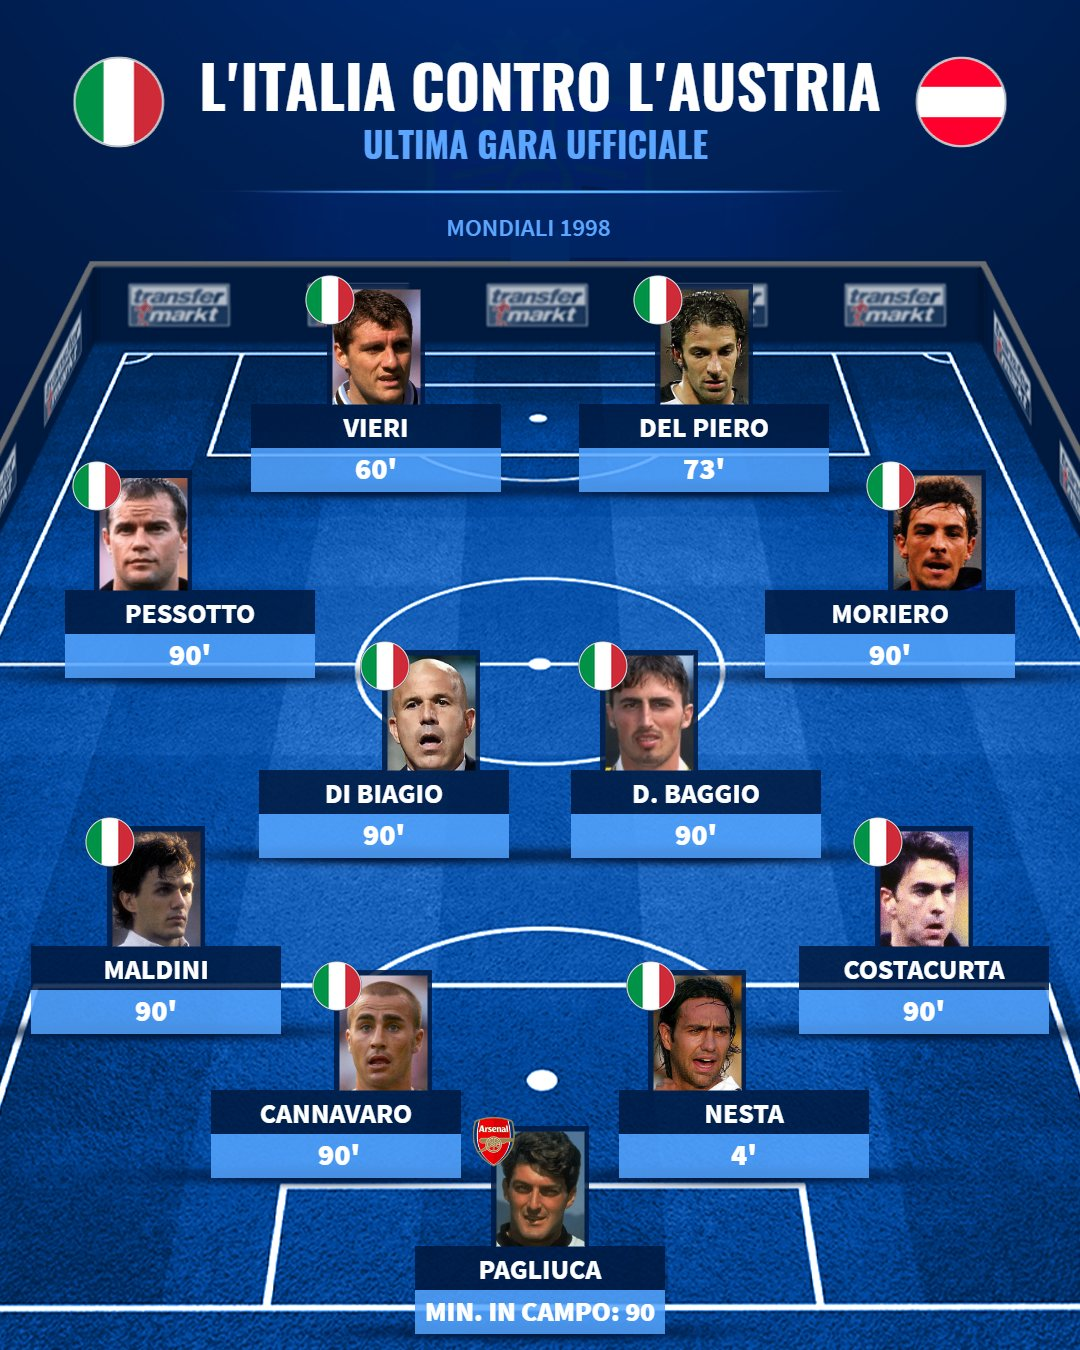 EURO 2020 - R16 : Italy - Austria E4vUD15XEAMPpDe?format=jpg&name=large